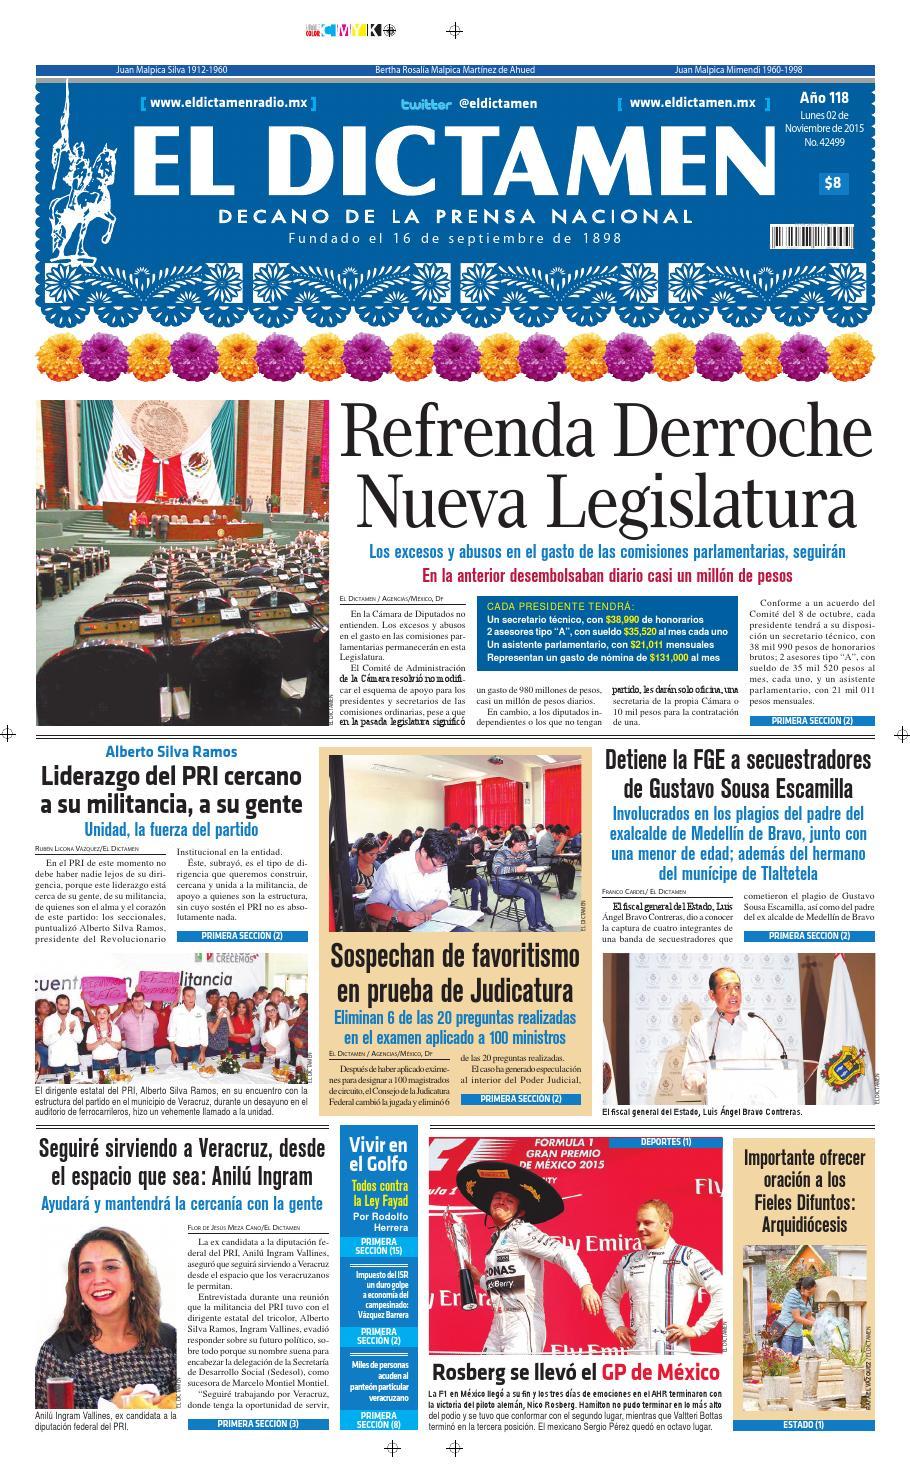 El Dictamen 02 de noviembre de 2015 by El Dictamen - issuu 935b14e412a